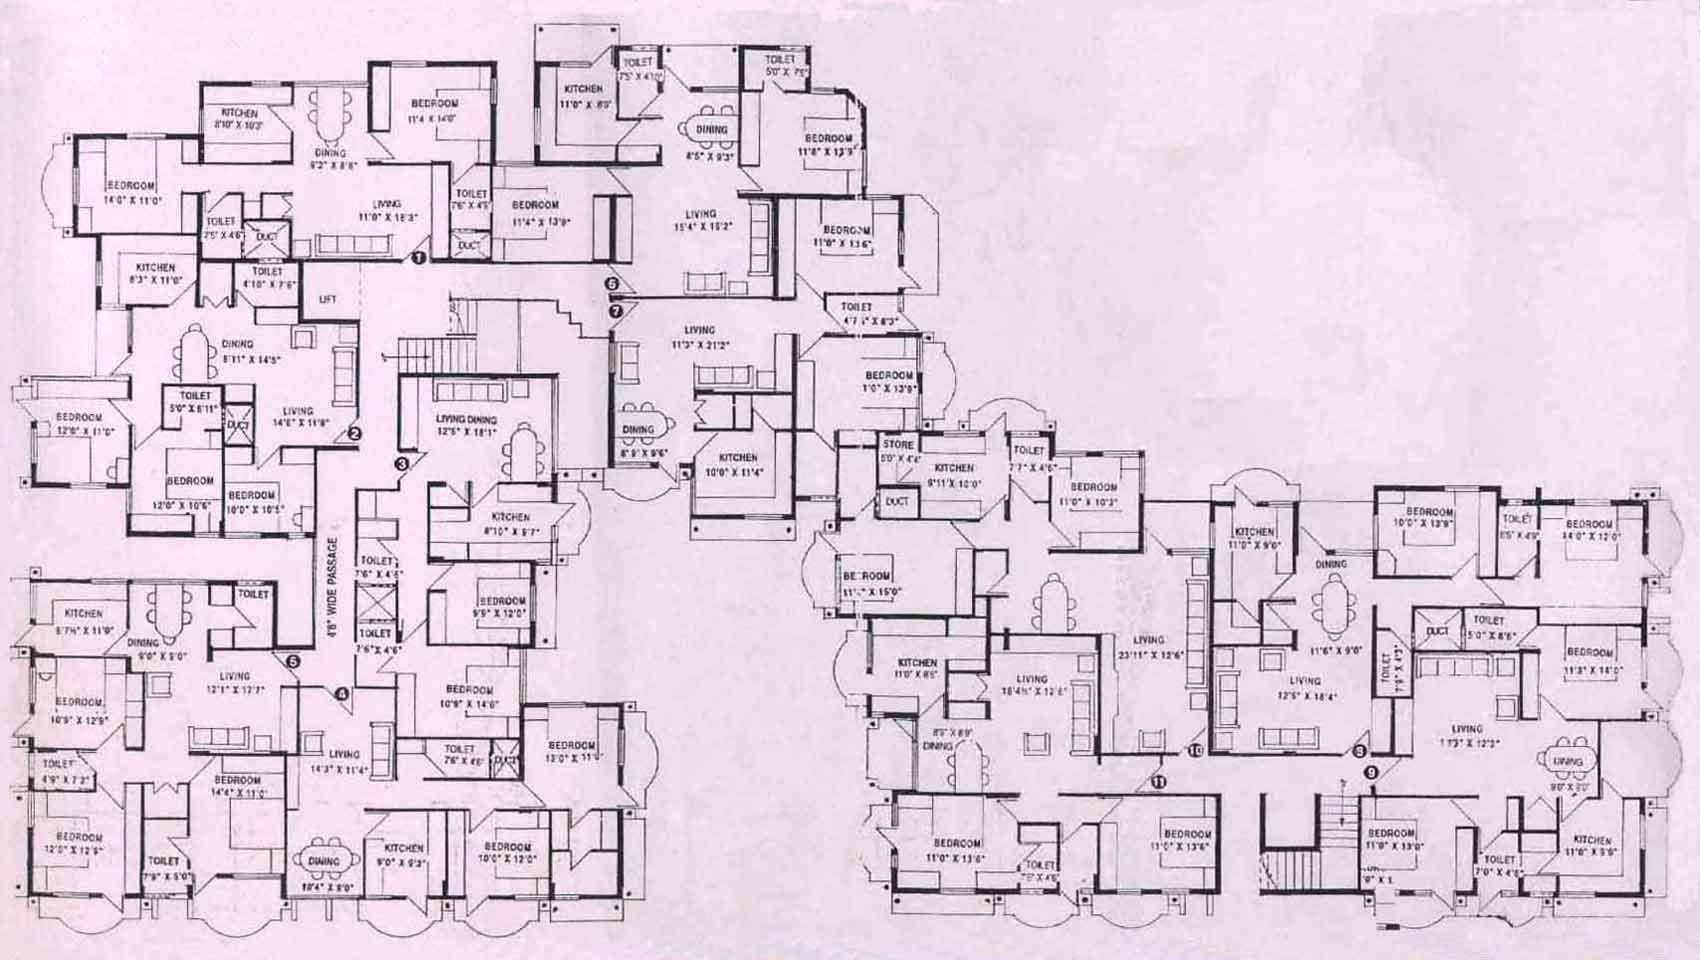 Apoorva Mansion Floor Plan House Floor Plans House Plans Mansion House Blueprints